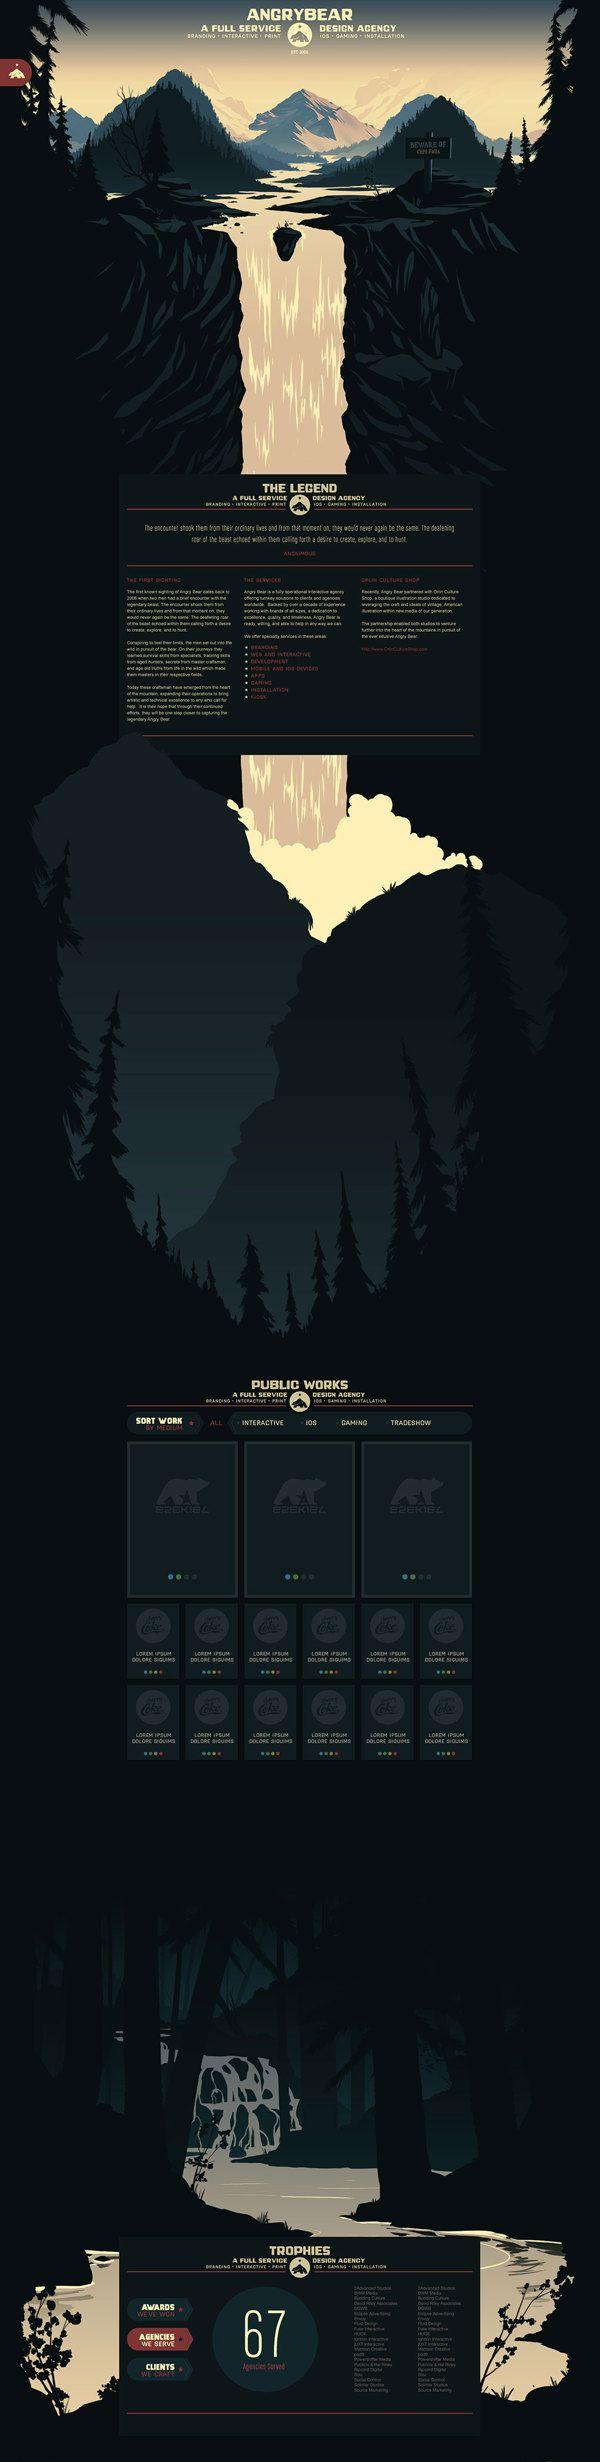 Unique Web Design, Angry Bear #WebDesign #Design (http://www.pinterest.com/aldenchong/)